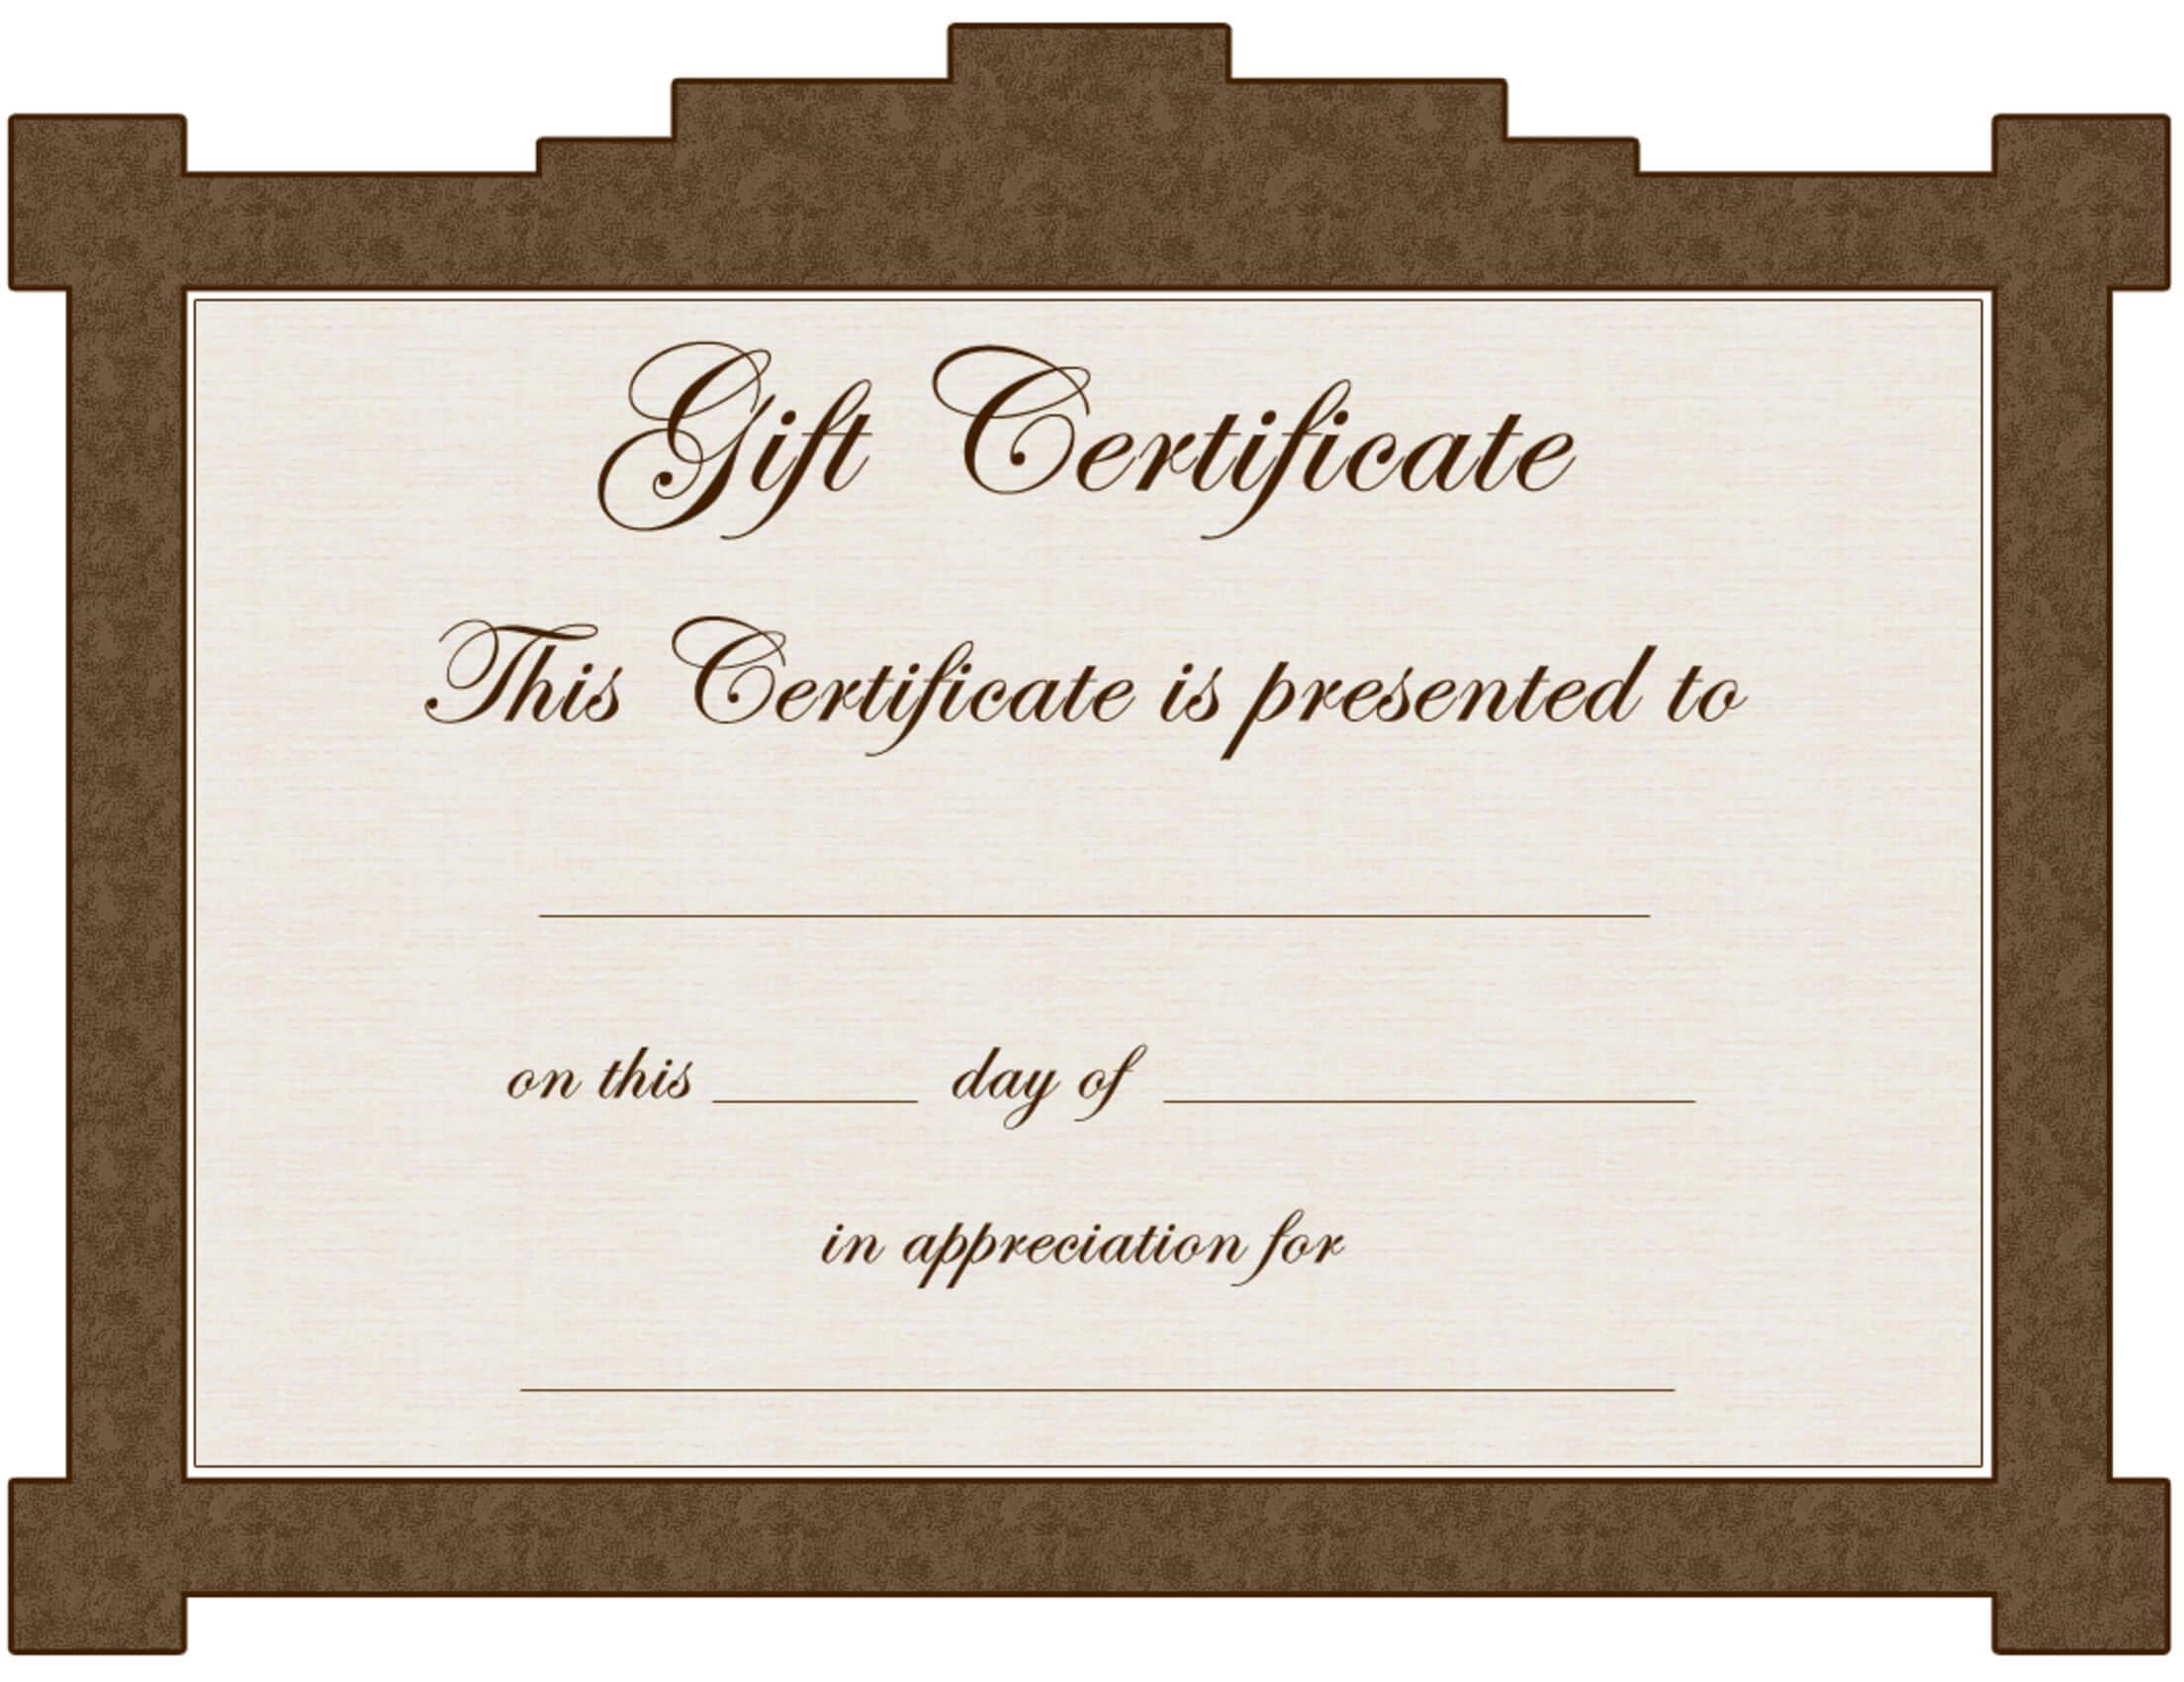 Avon Gift Certificate Template – Clip Art Library Intended For Tattoo Gift Certificate Template